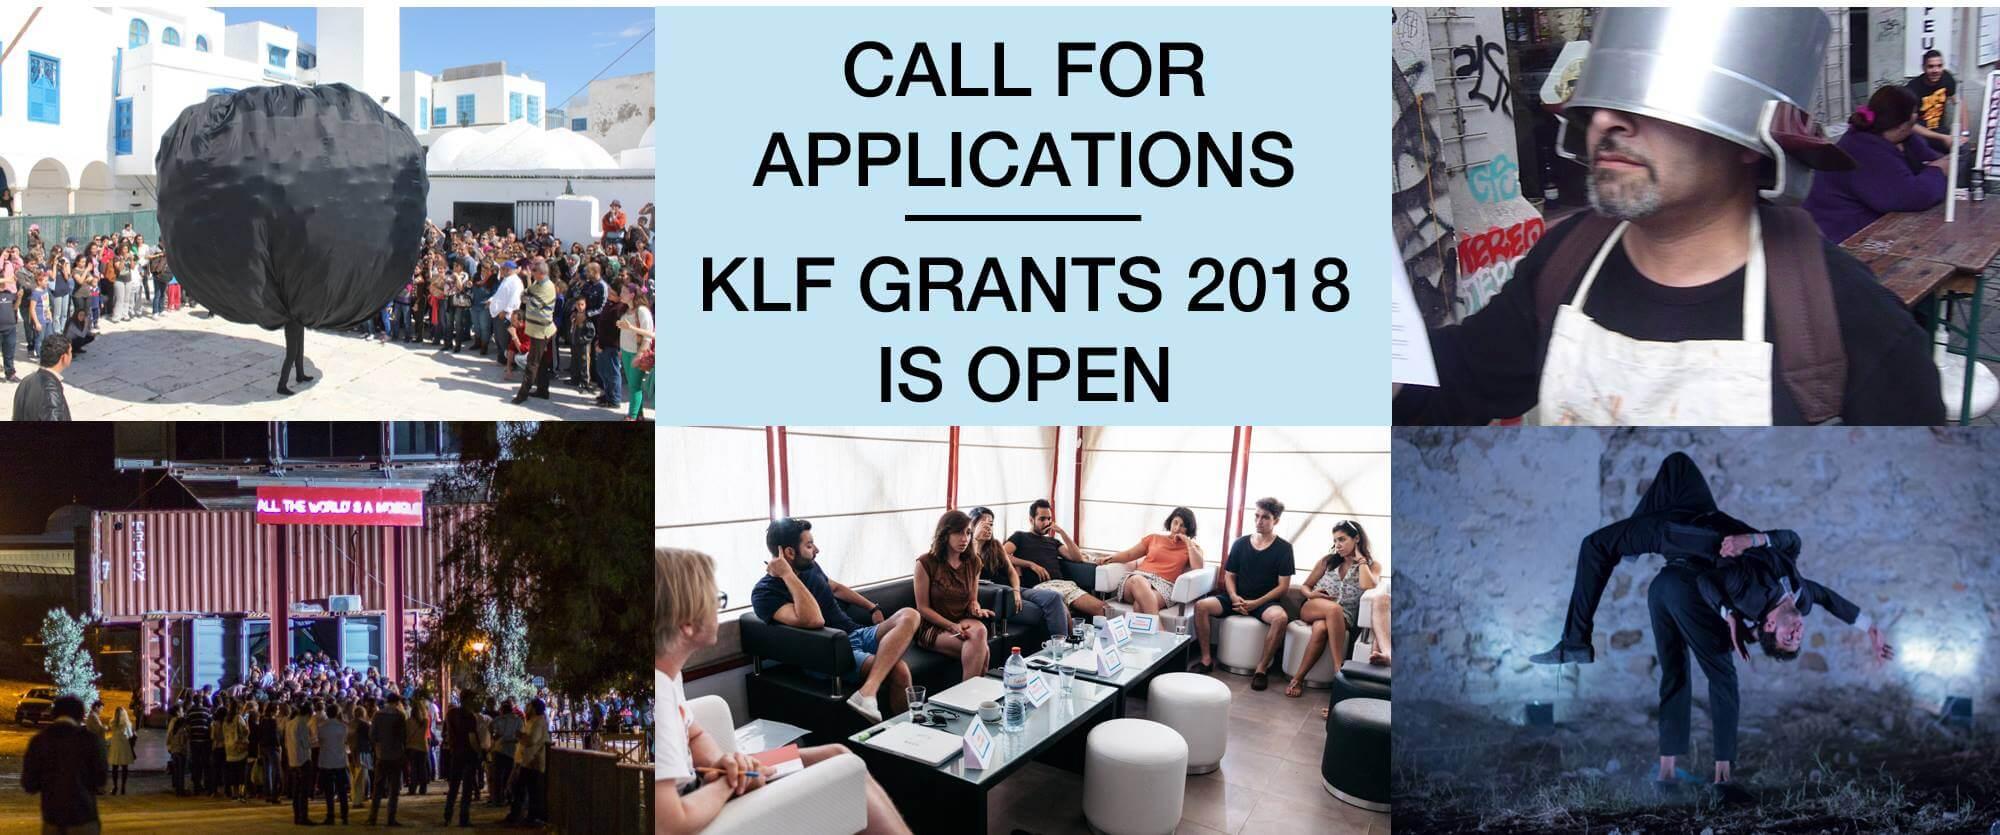 KLF Mécénat 2018